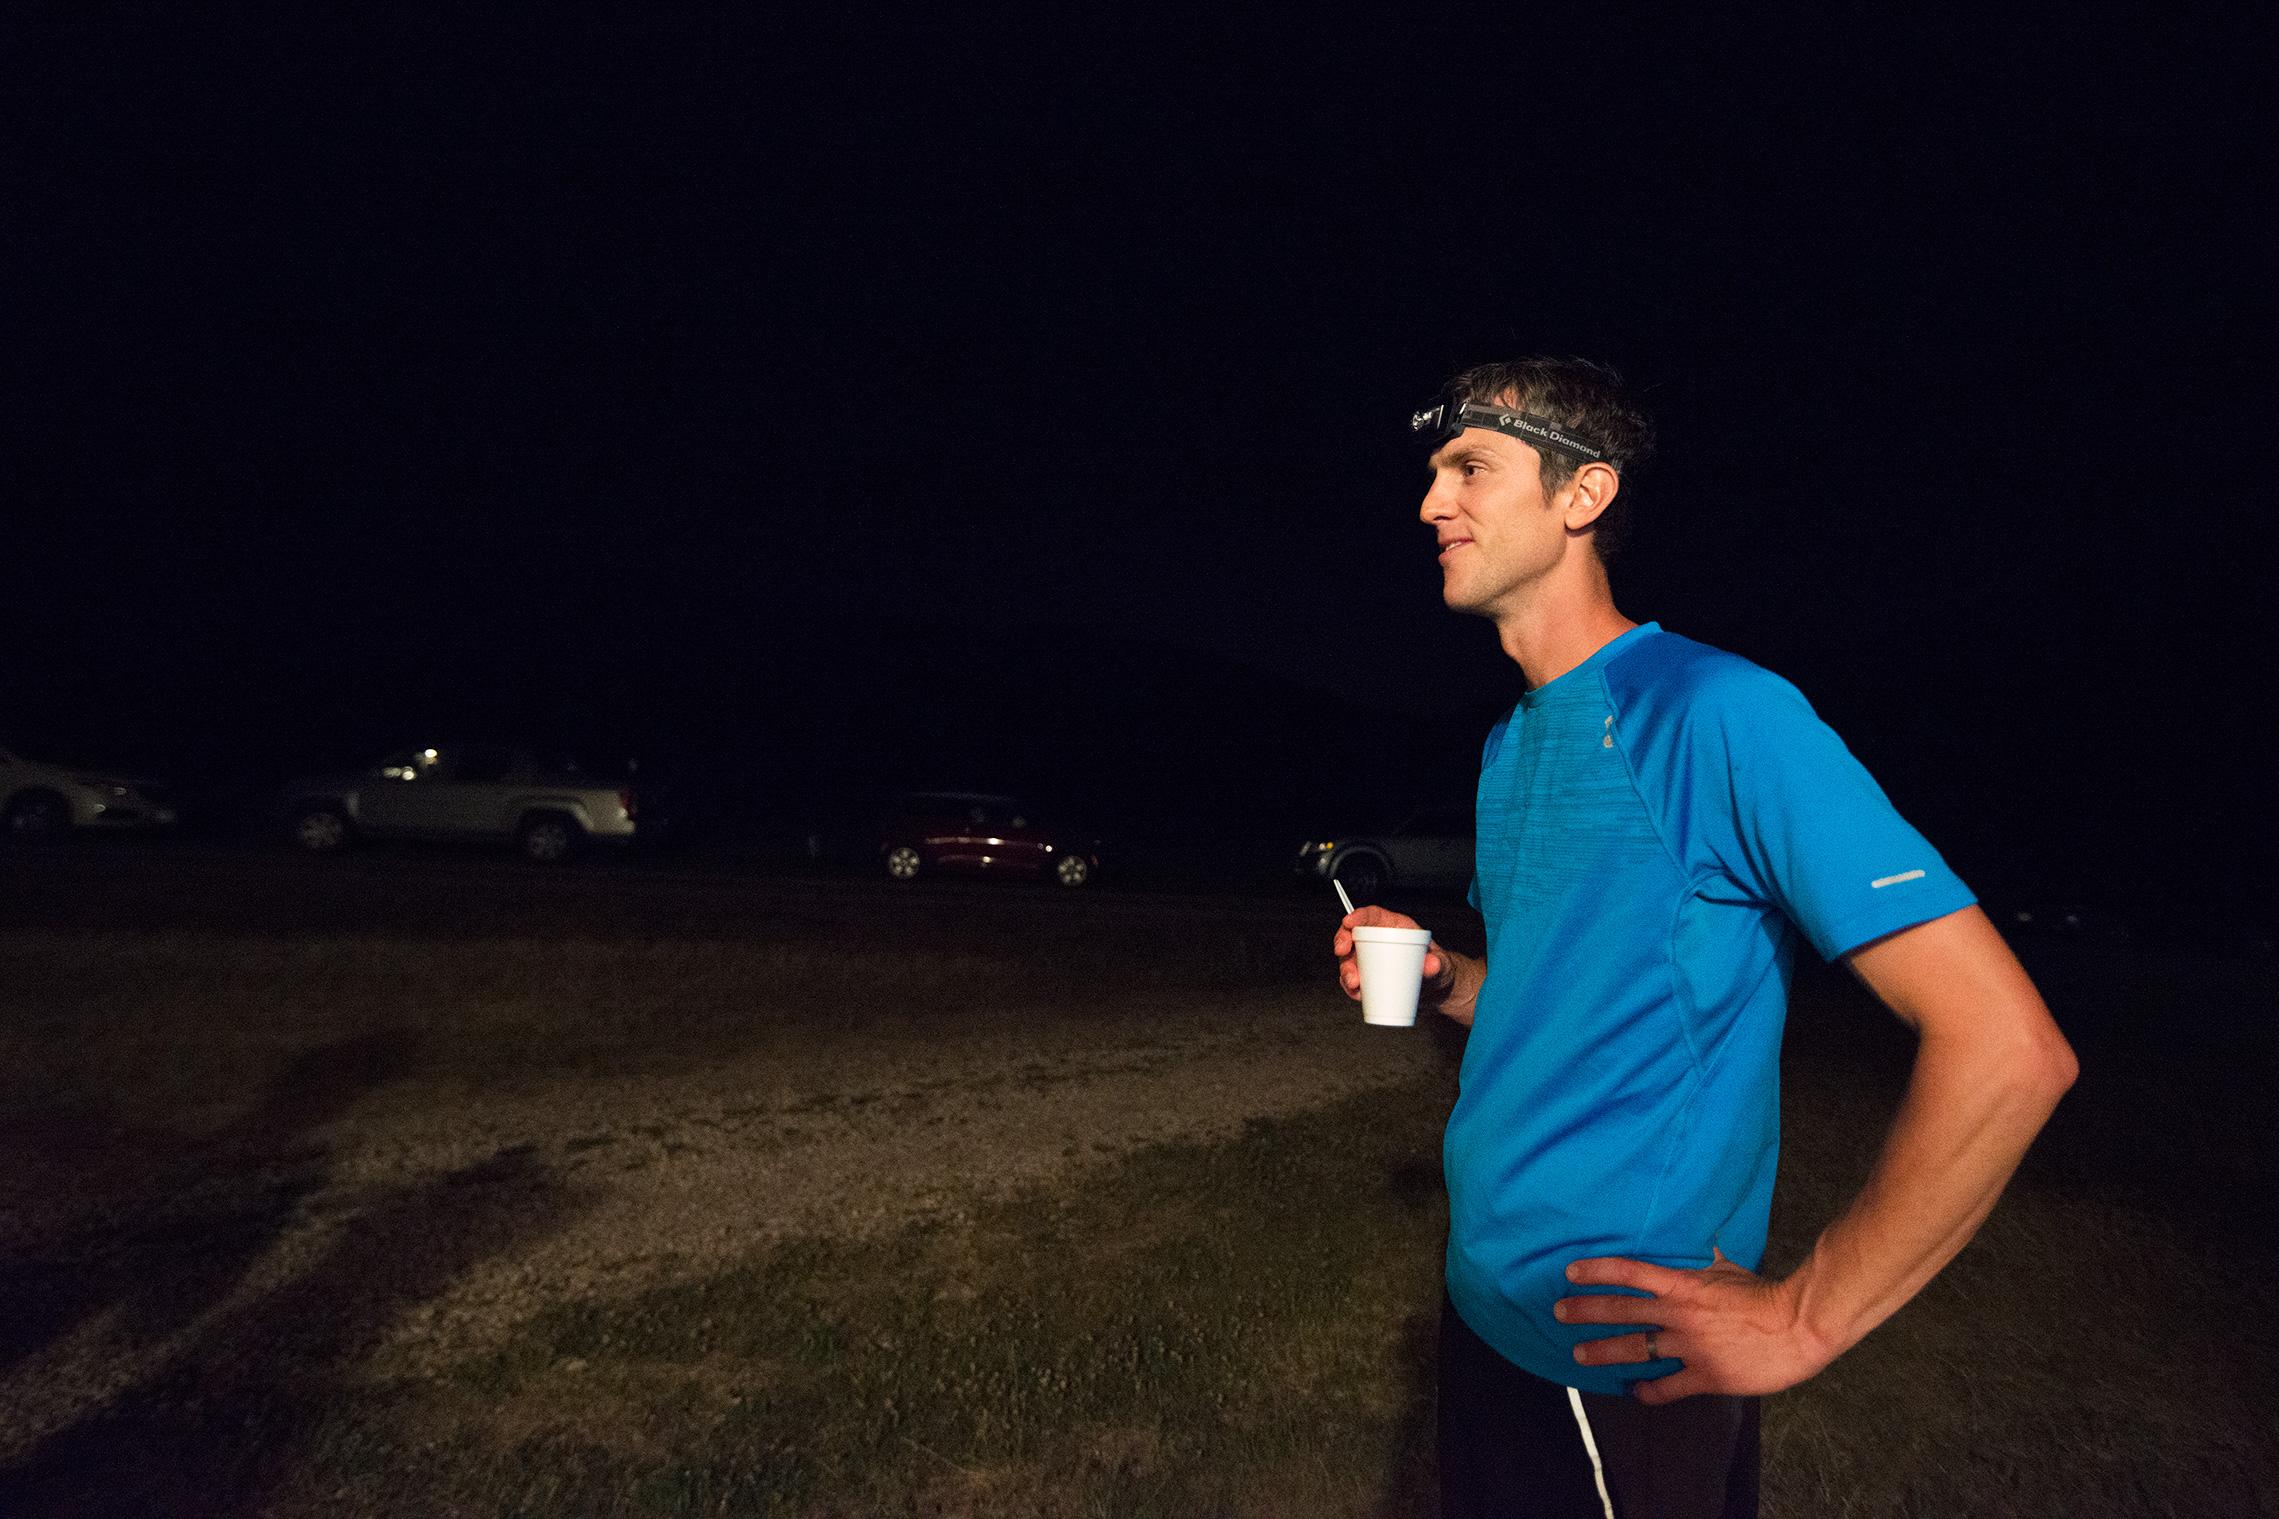 Ultra Marathon Runner at Aid Station